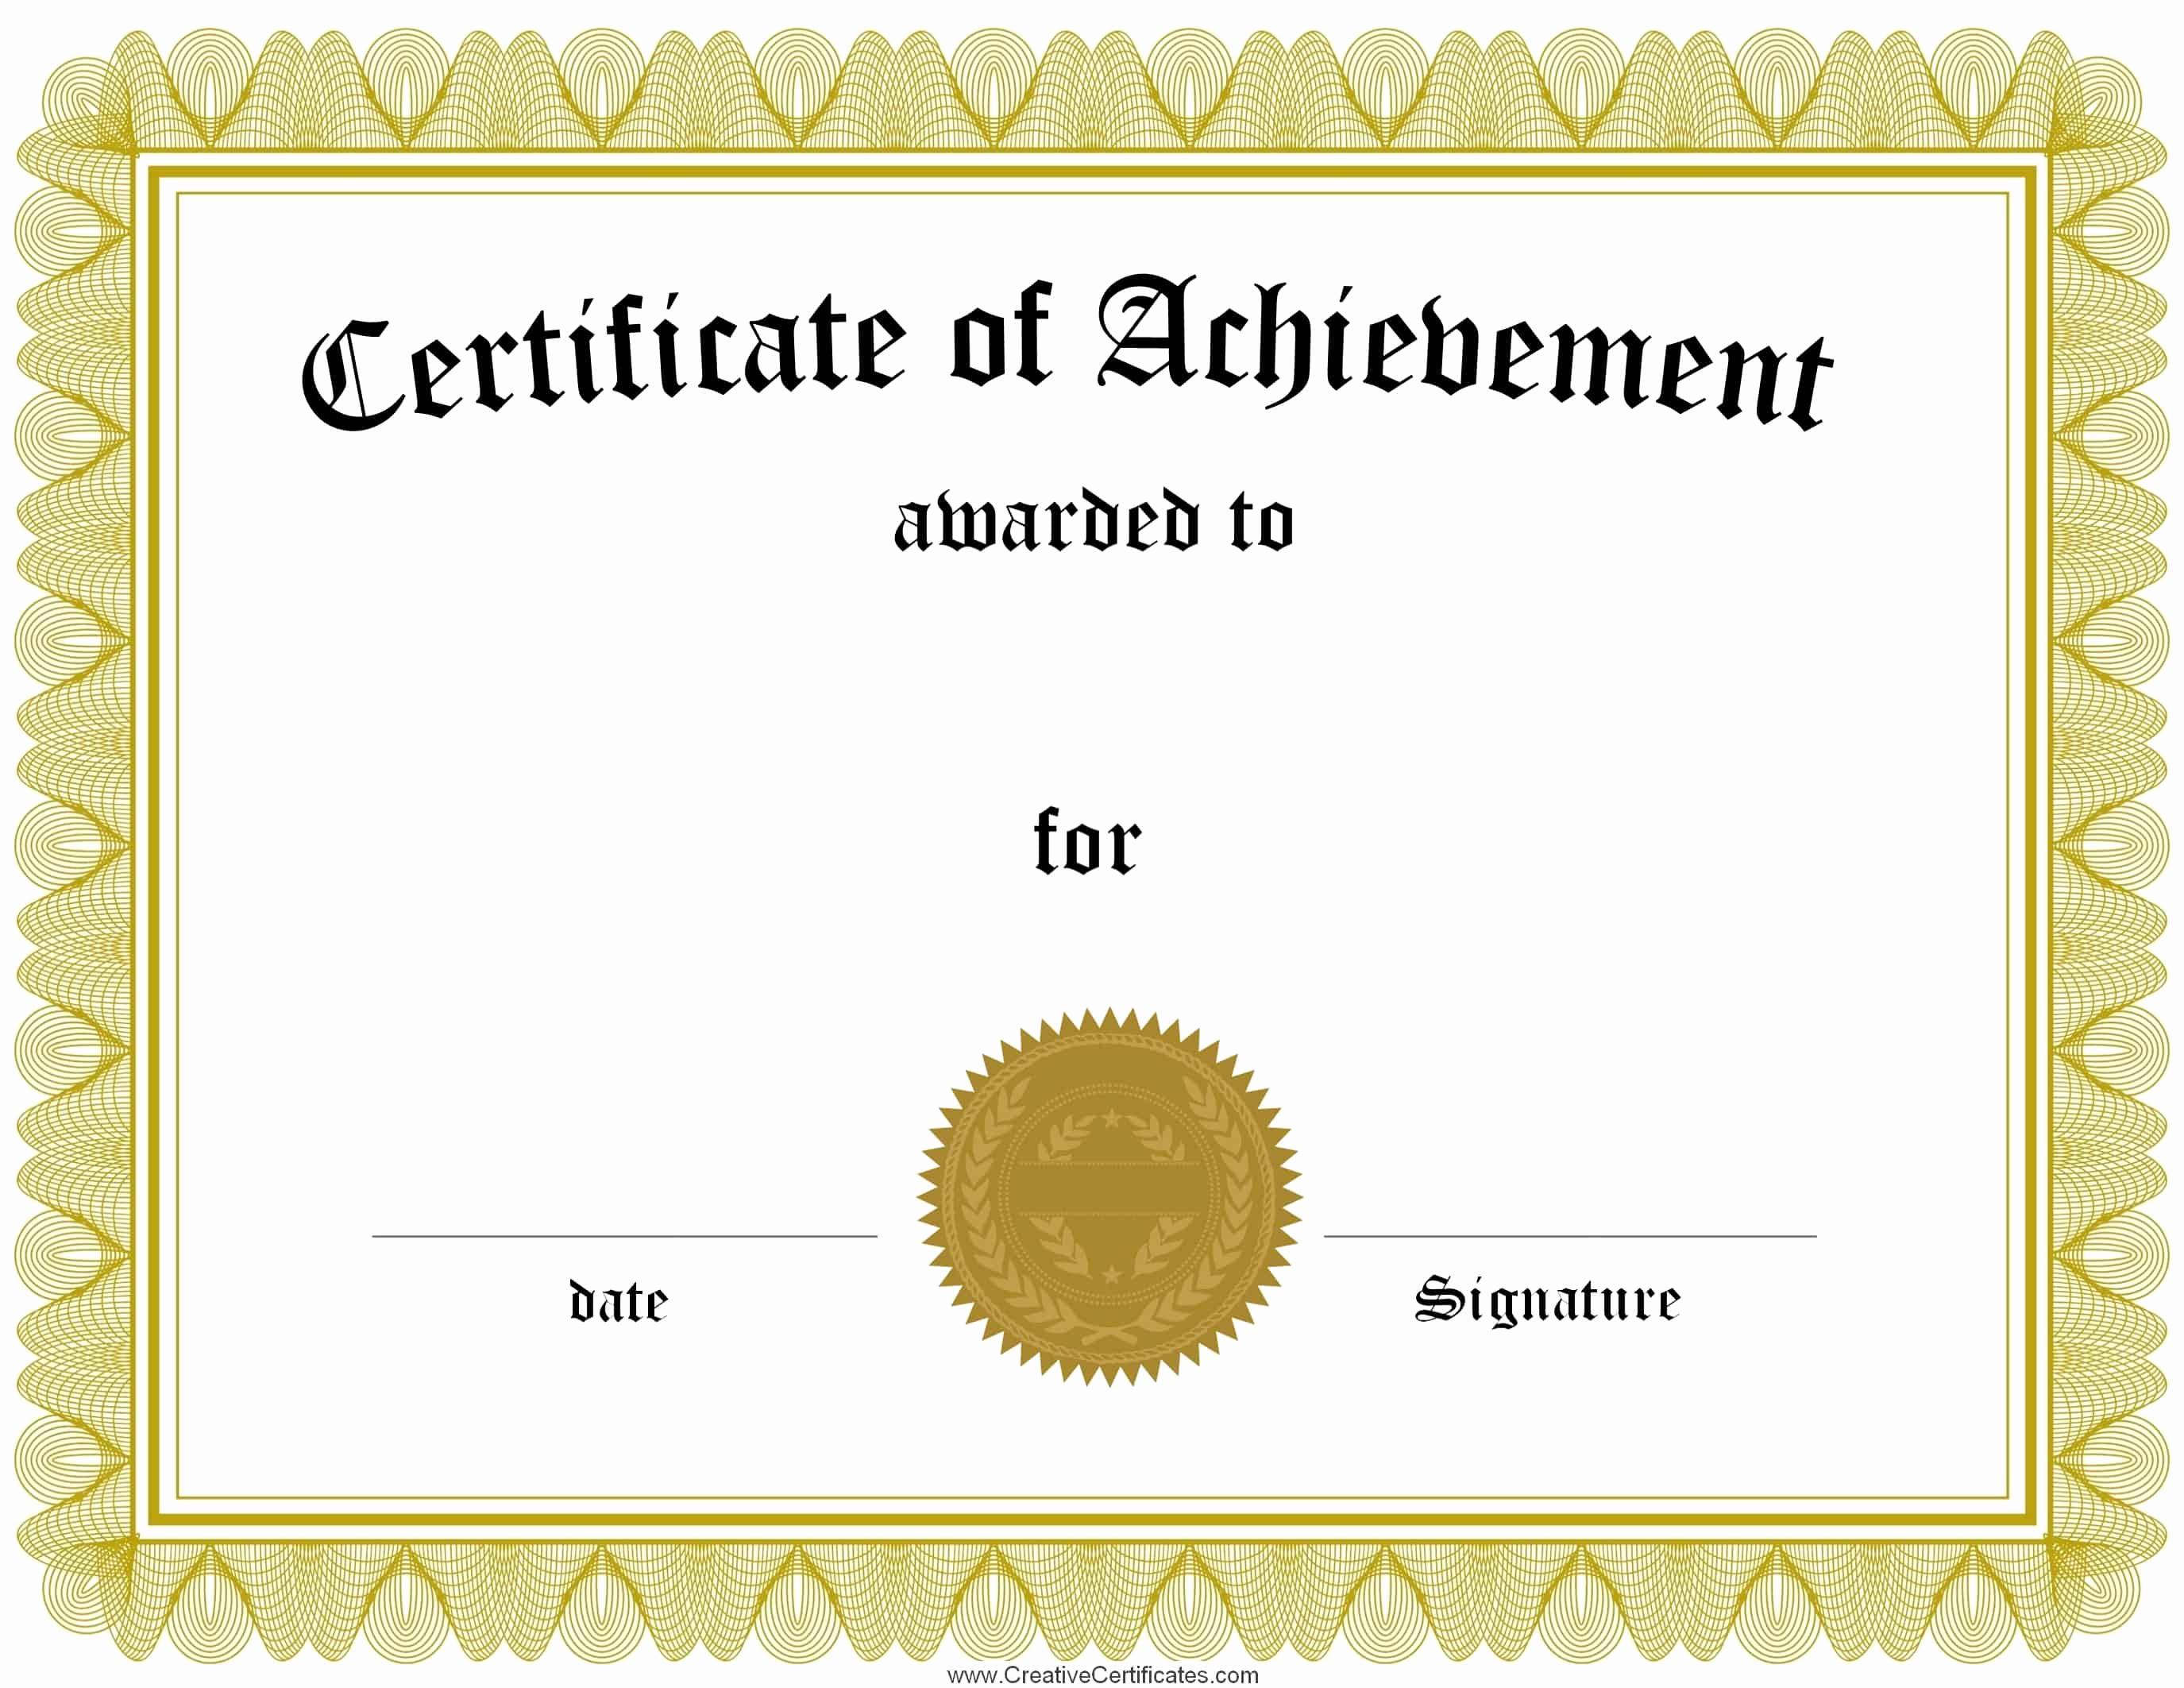 Free Printable Award Certificates Beautiful Free Customizable Certificate Of Achievement